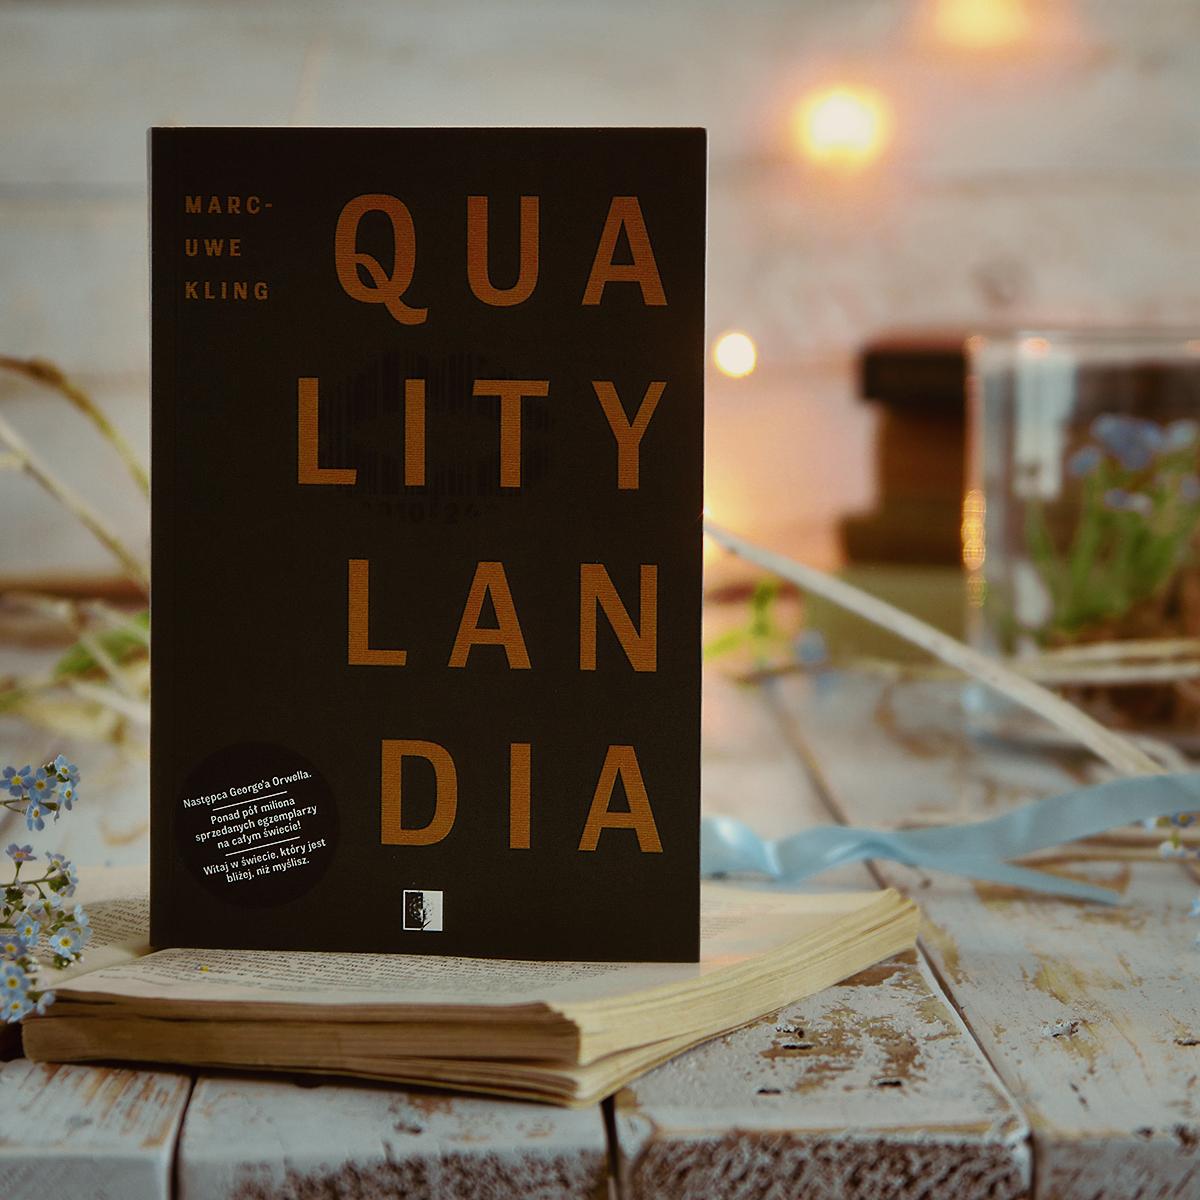 QualityLandia - Marc-Uwe Kling - PATRONAT MEDIALNY